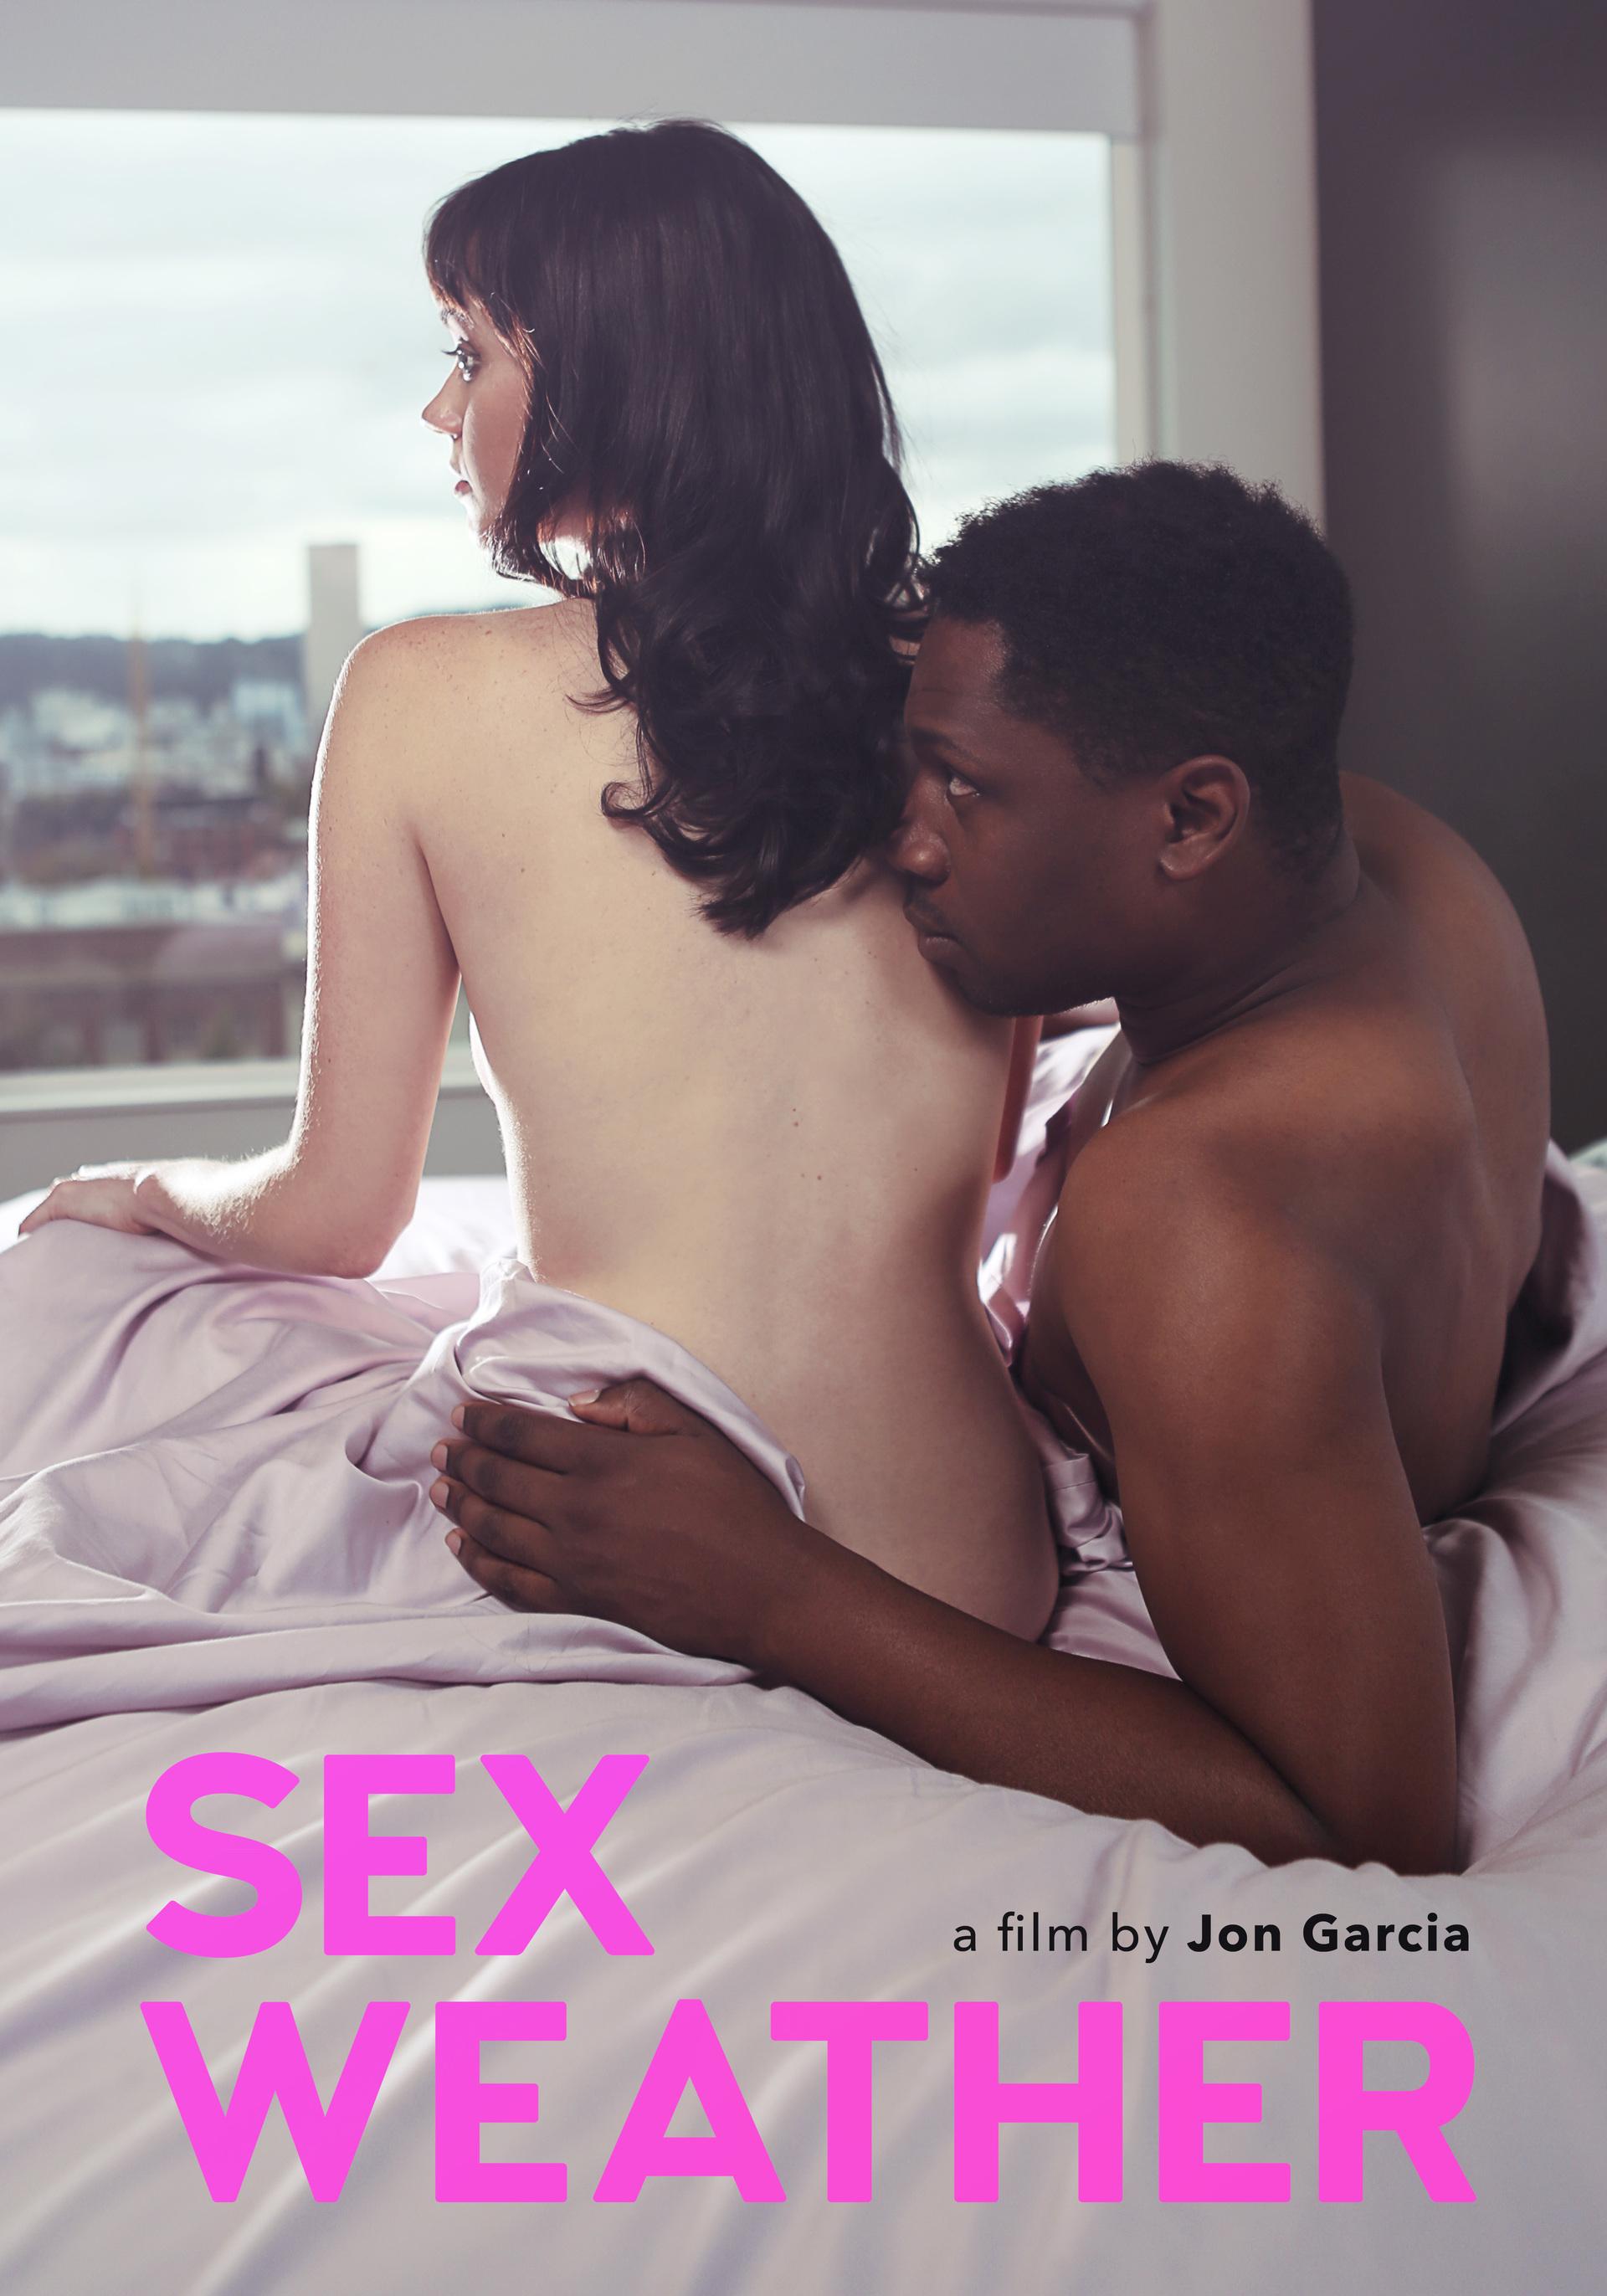 SexWeather_KA_Final.jpg?1540431501